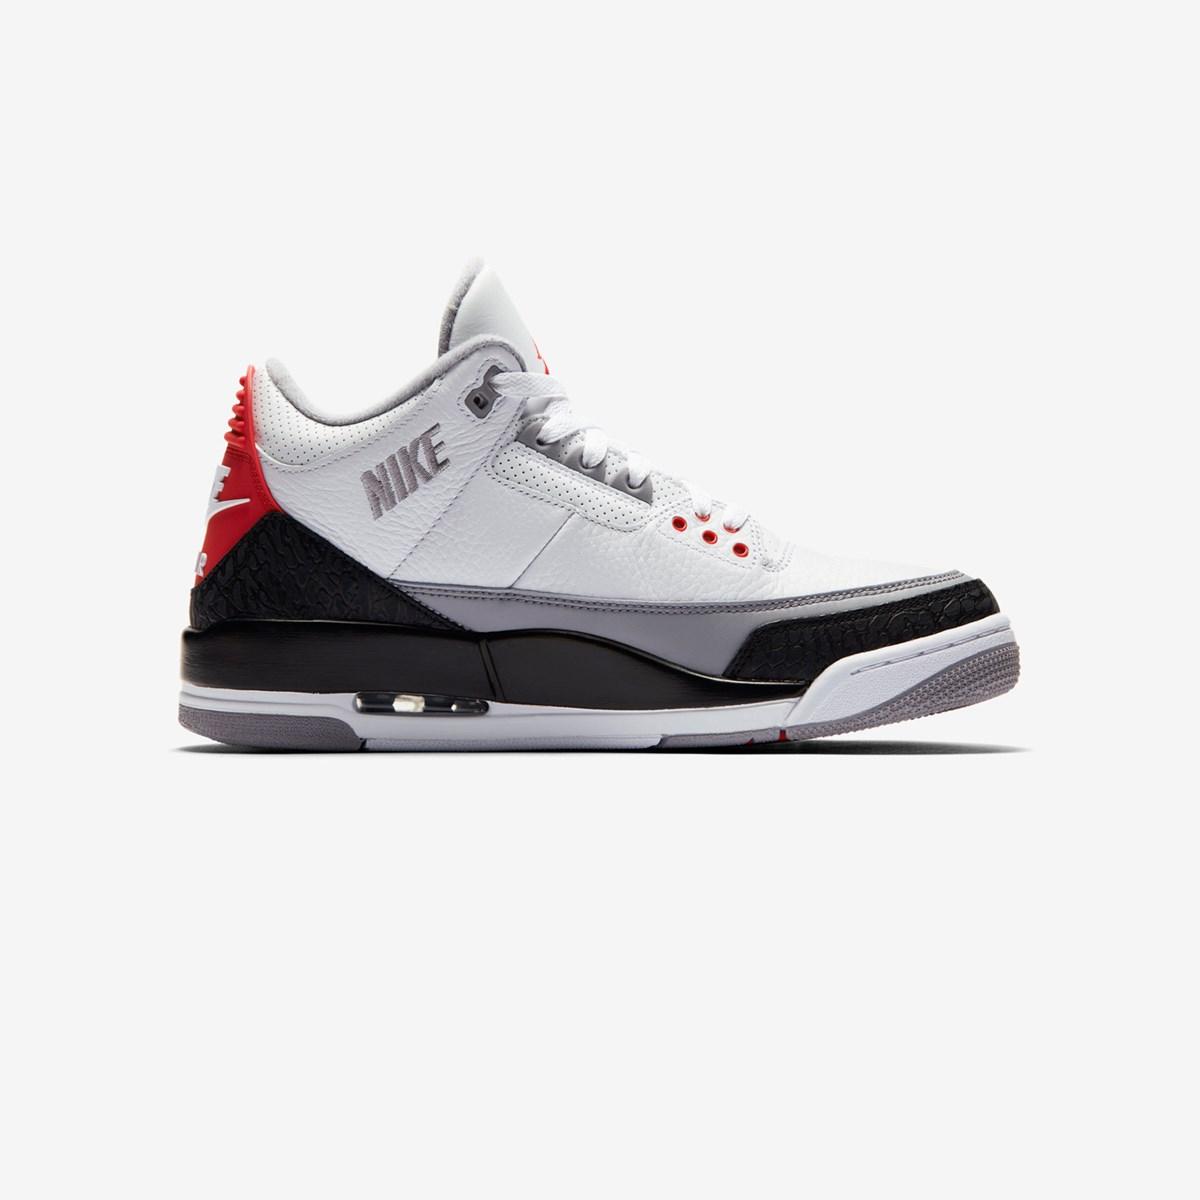 new style b2f59 8719b jordan brand air 3 retro tinker nrg aq3835 160 sneakers   streetwear på  nätet